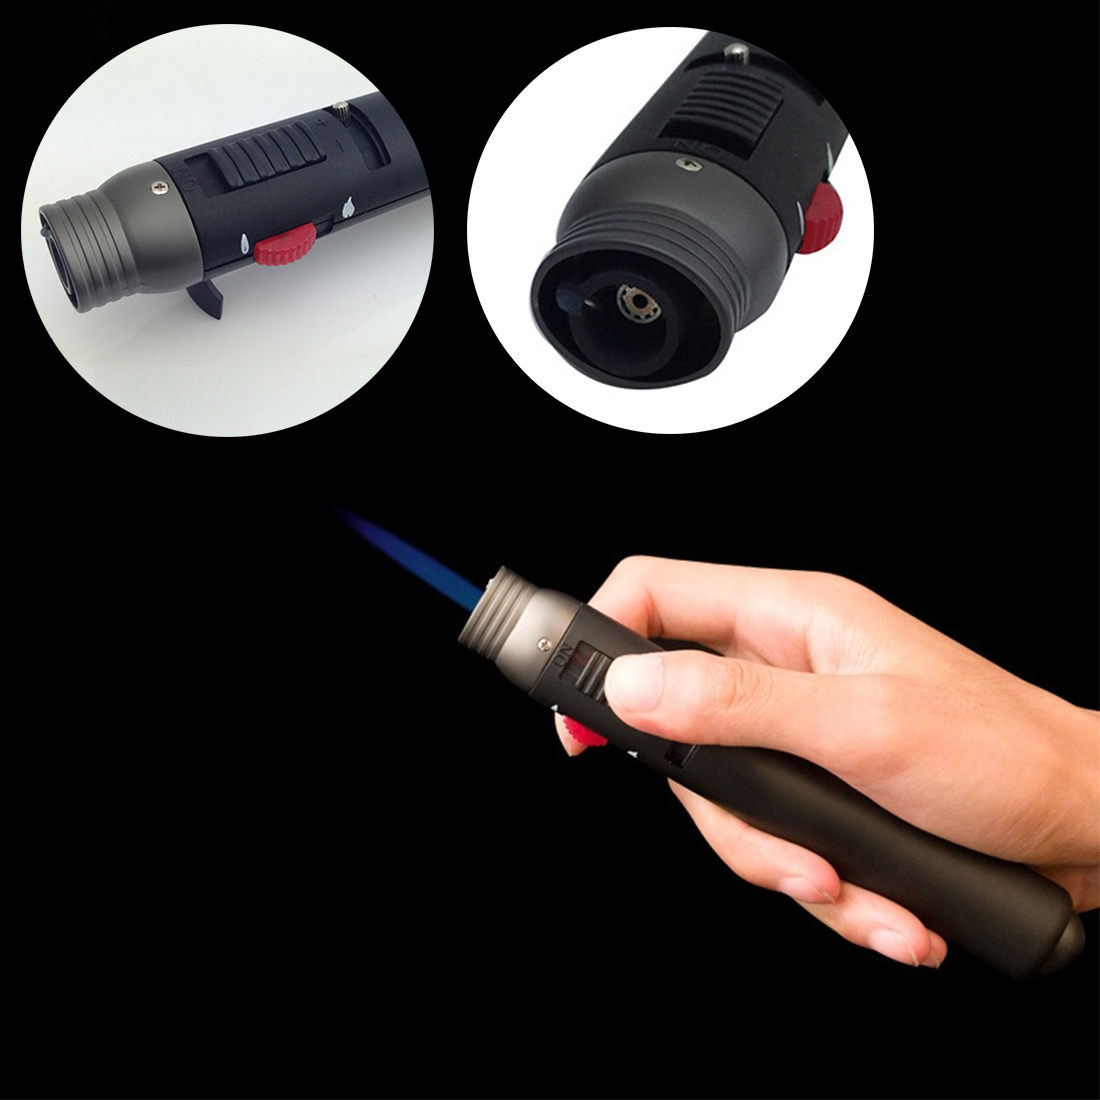 Welding Soldering Pen Outdoor Lighter 1300 Degree Torch Jet Flame Pencil Butane Gas Refillable Fuel